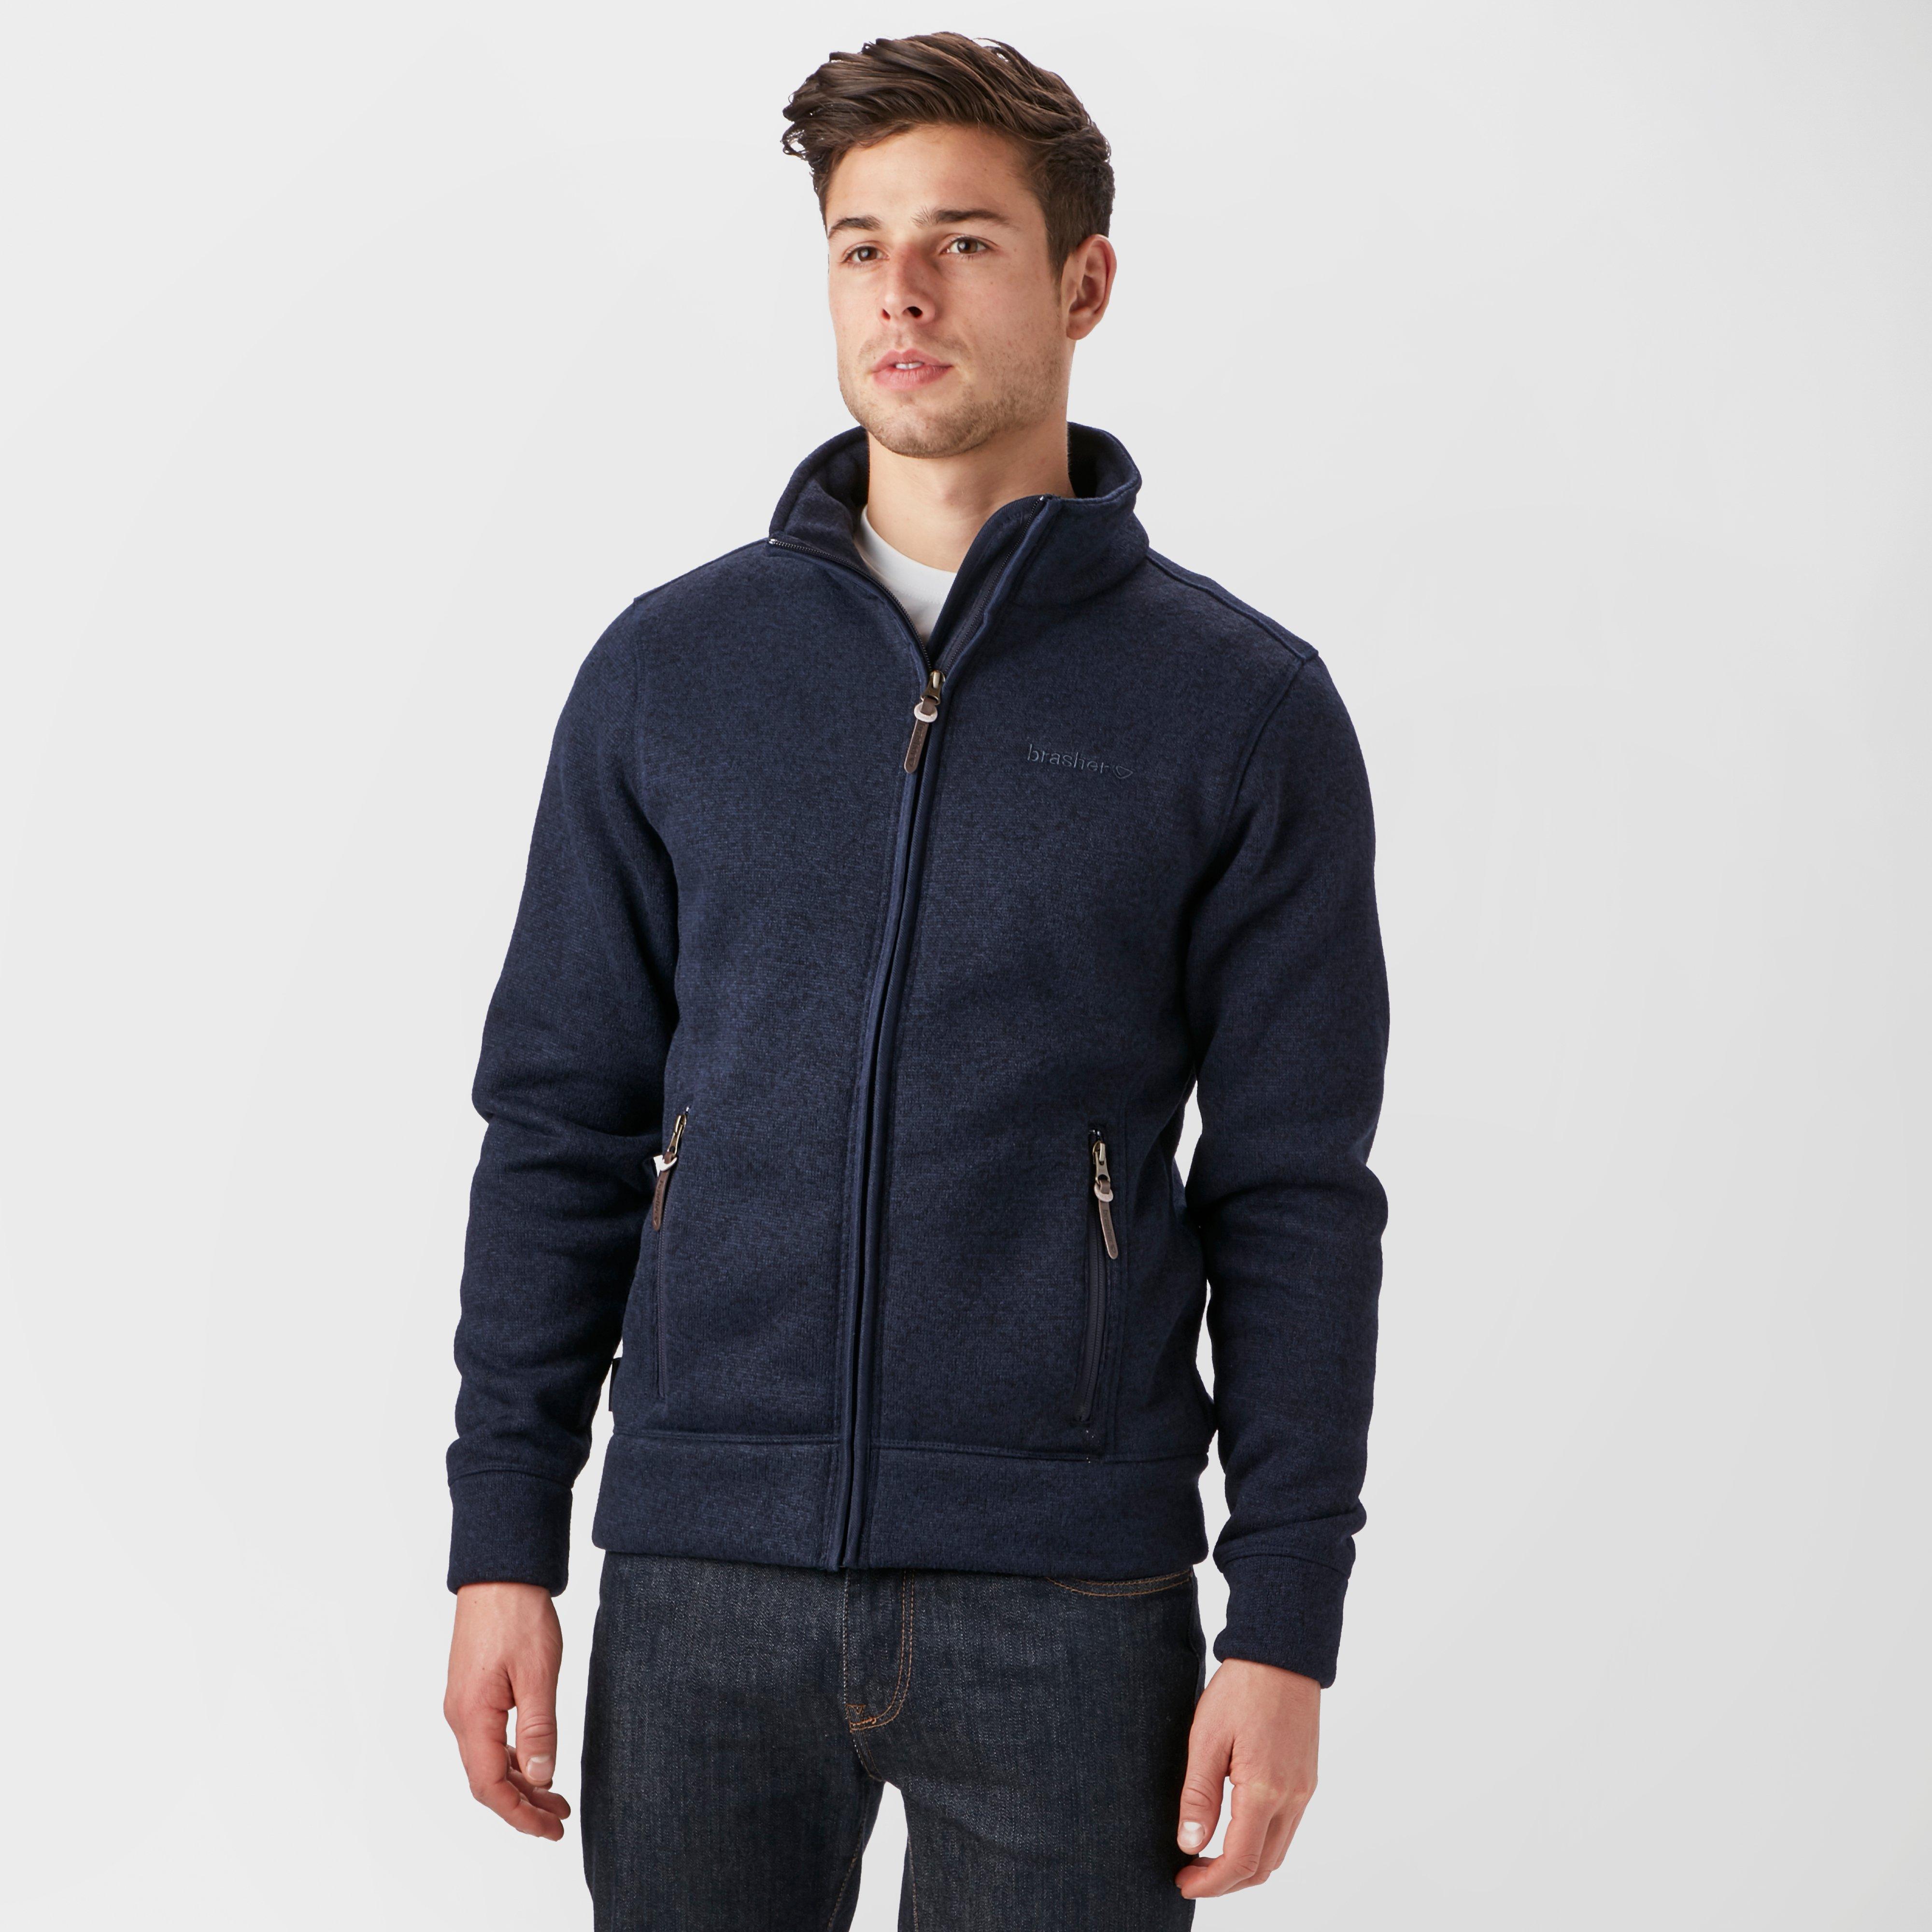 Brasher Mens Rydal Ii Fleece Jacket - Navy/nvy  Navy/nvy